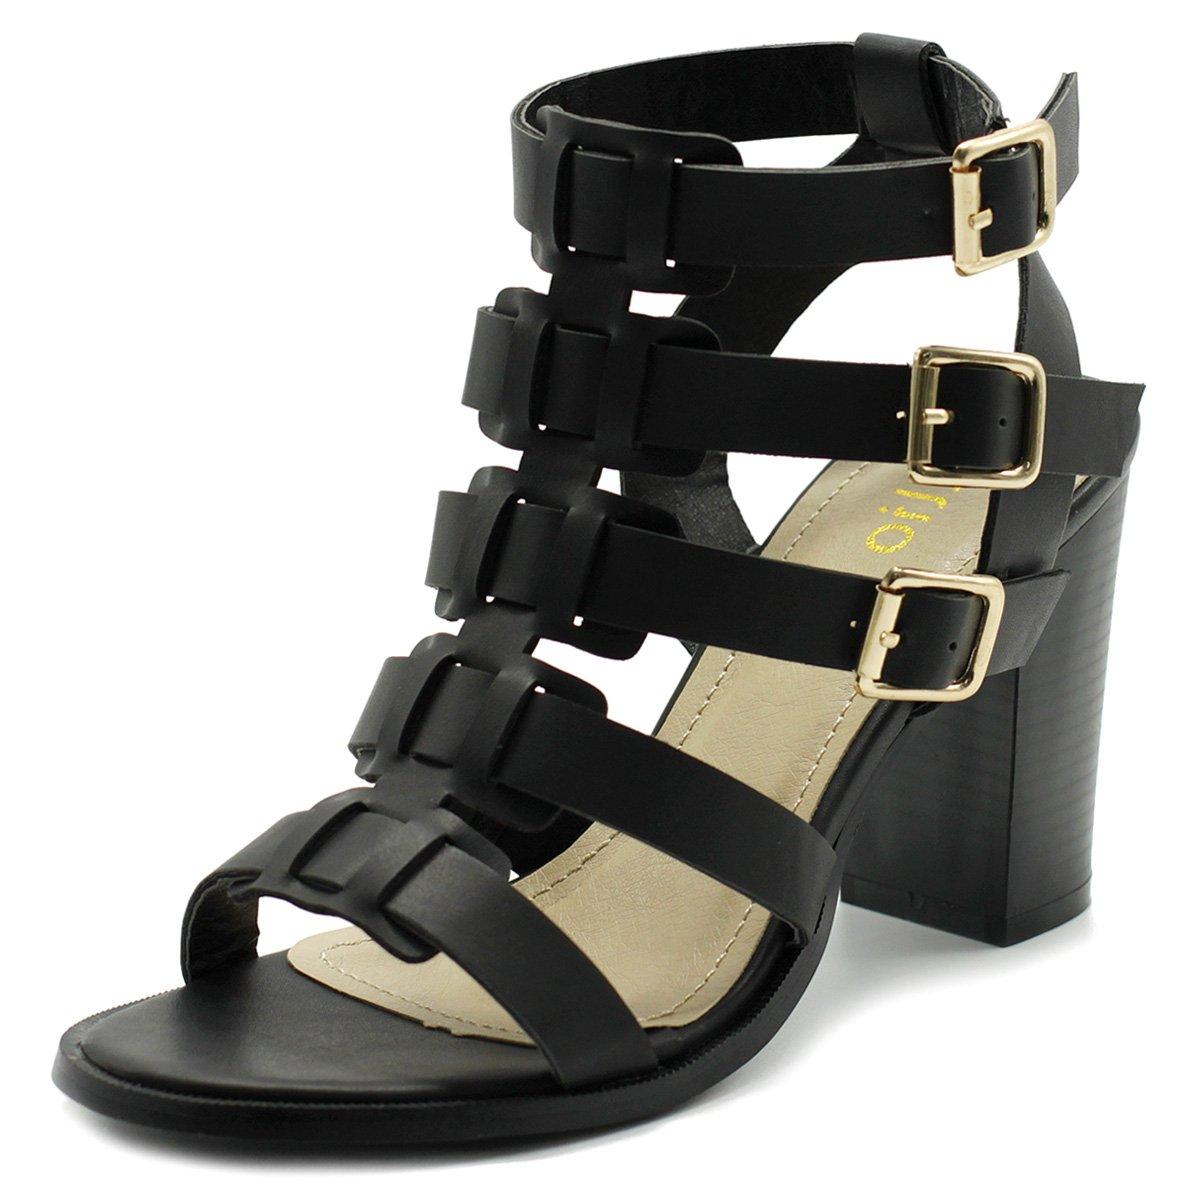 Ollio Womens Shoe Gladiator Ankle High Bootie Sandal FT08 (9 B(M) US, Black) by Ollio